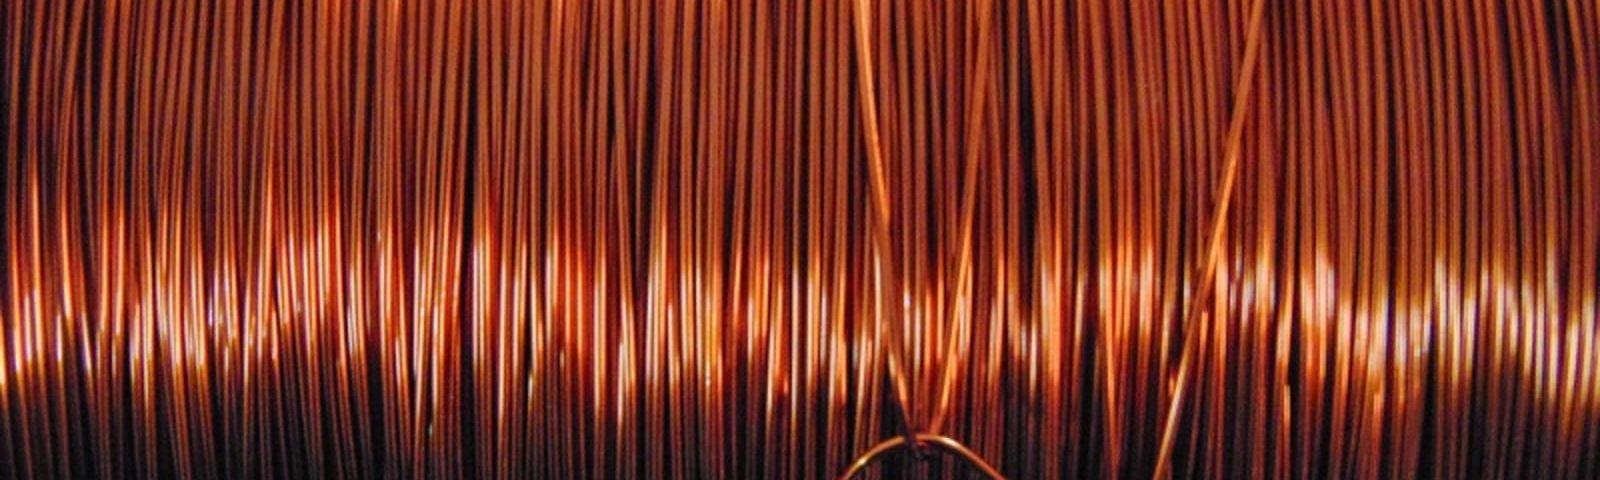 Copper's antimicrobial properties can kill Coronavirus